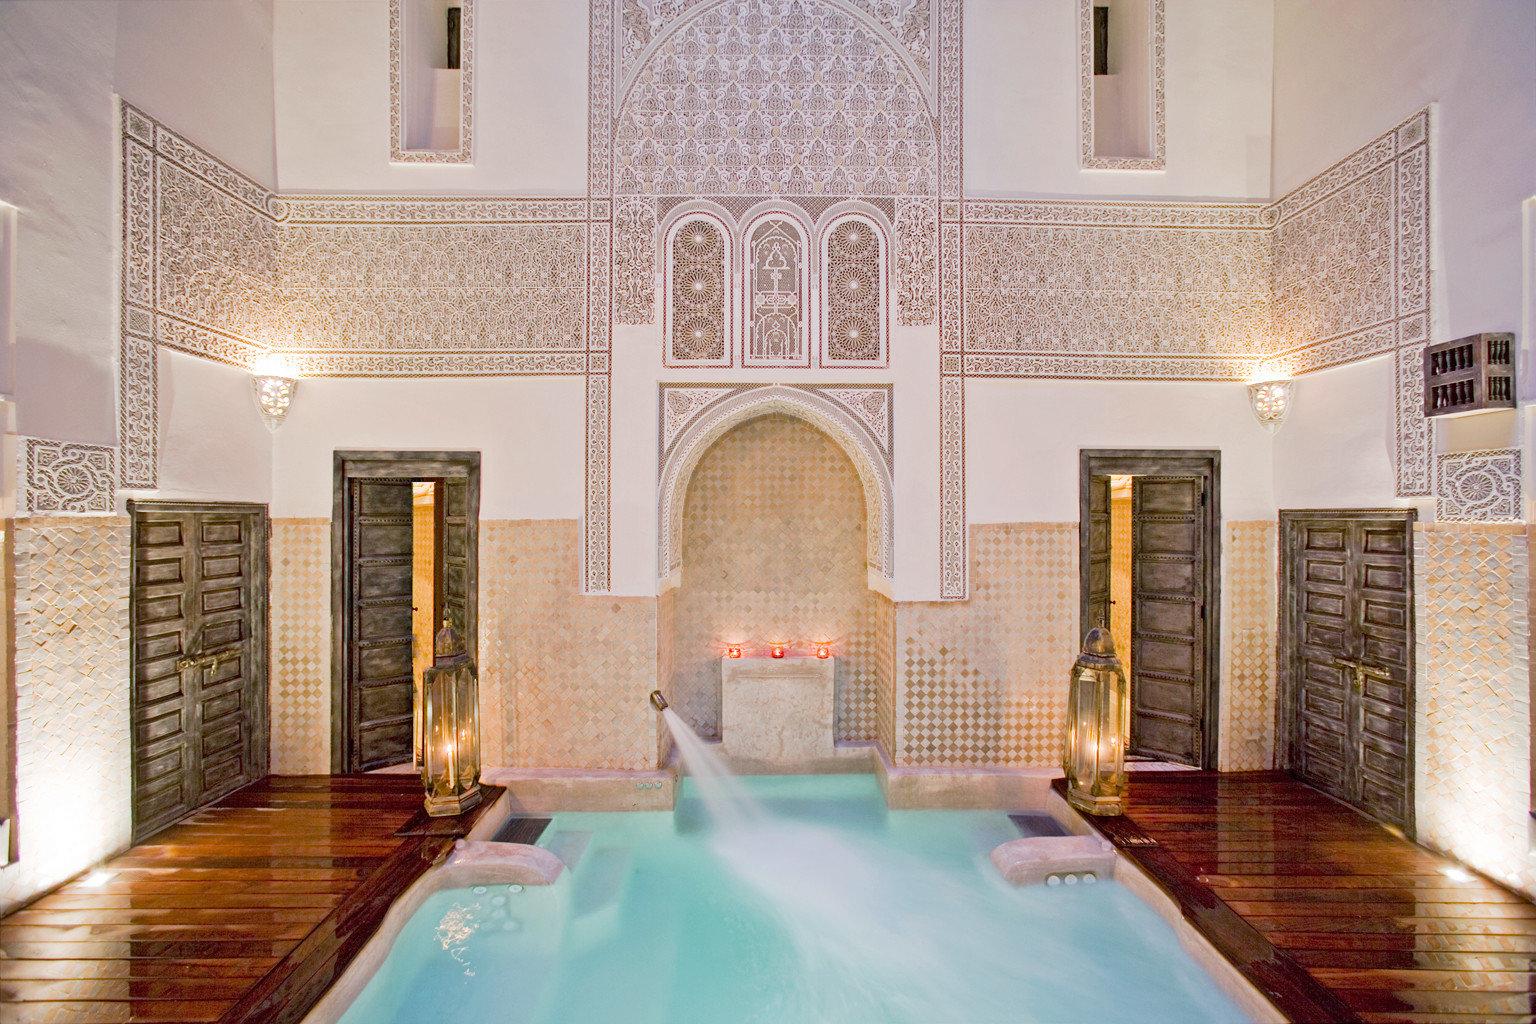 Pool Spa Wellness property mansion swimming pool Lobby palace Villa flooring